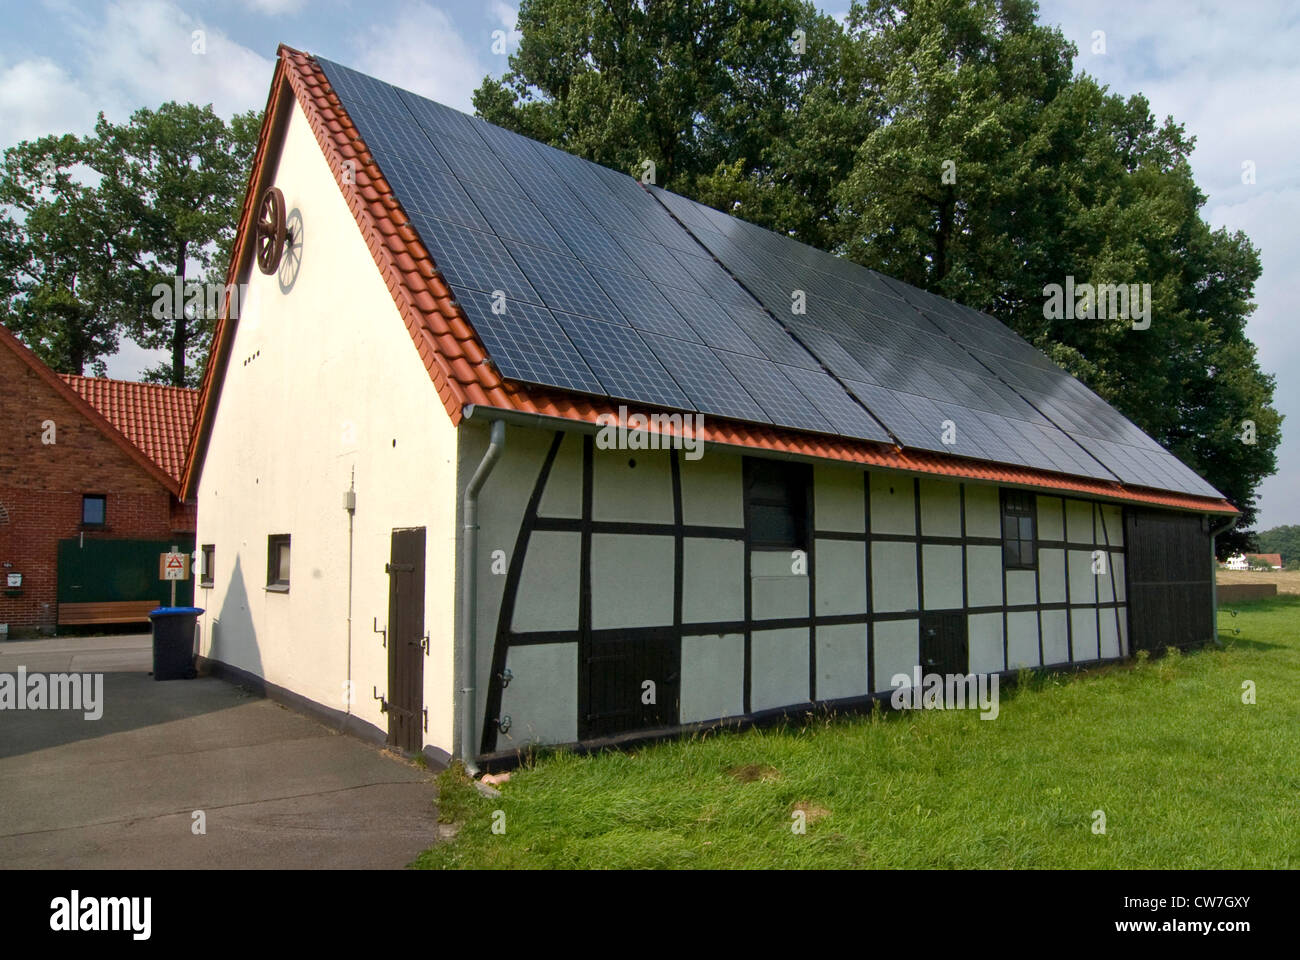 timber roof stockfotos timber roof bilder alamy. Black Bedroom Furniture Sets. Home Design Ideas